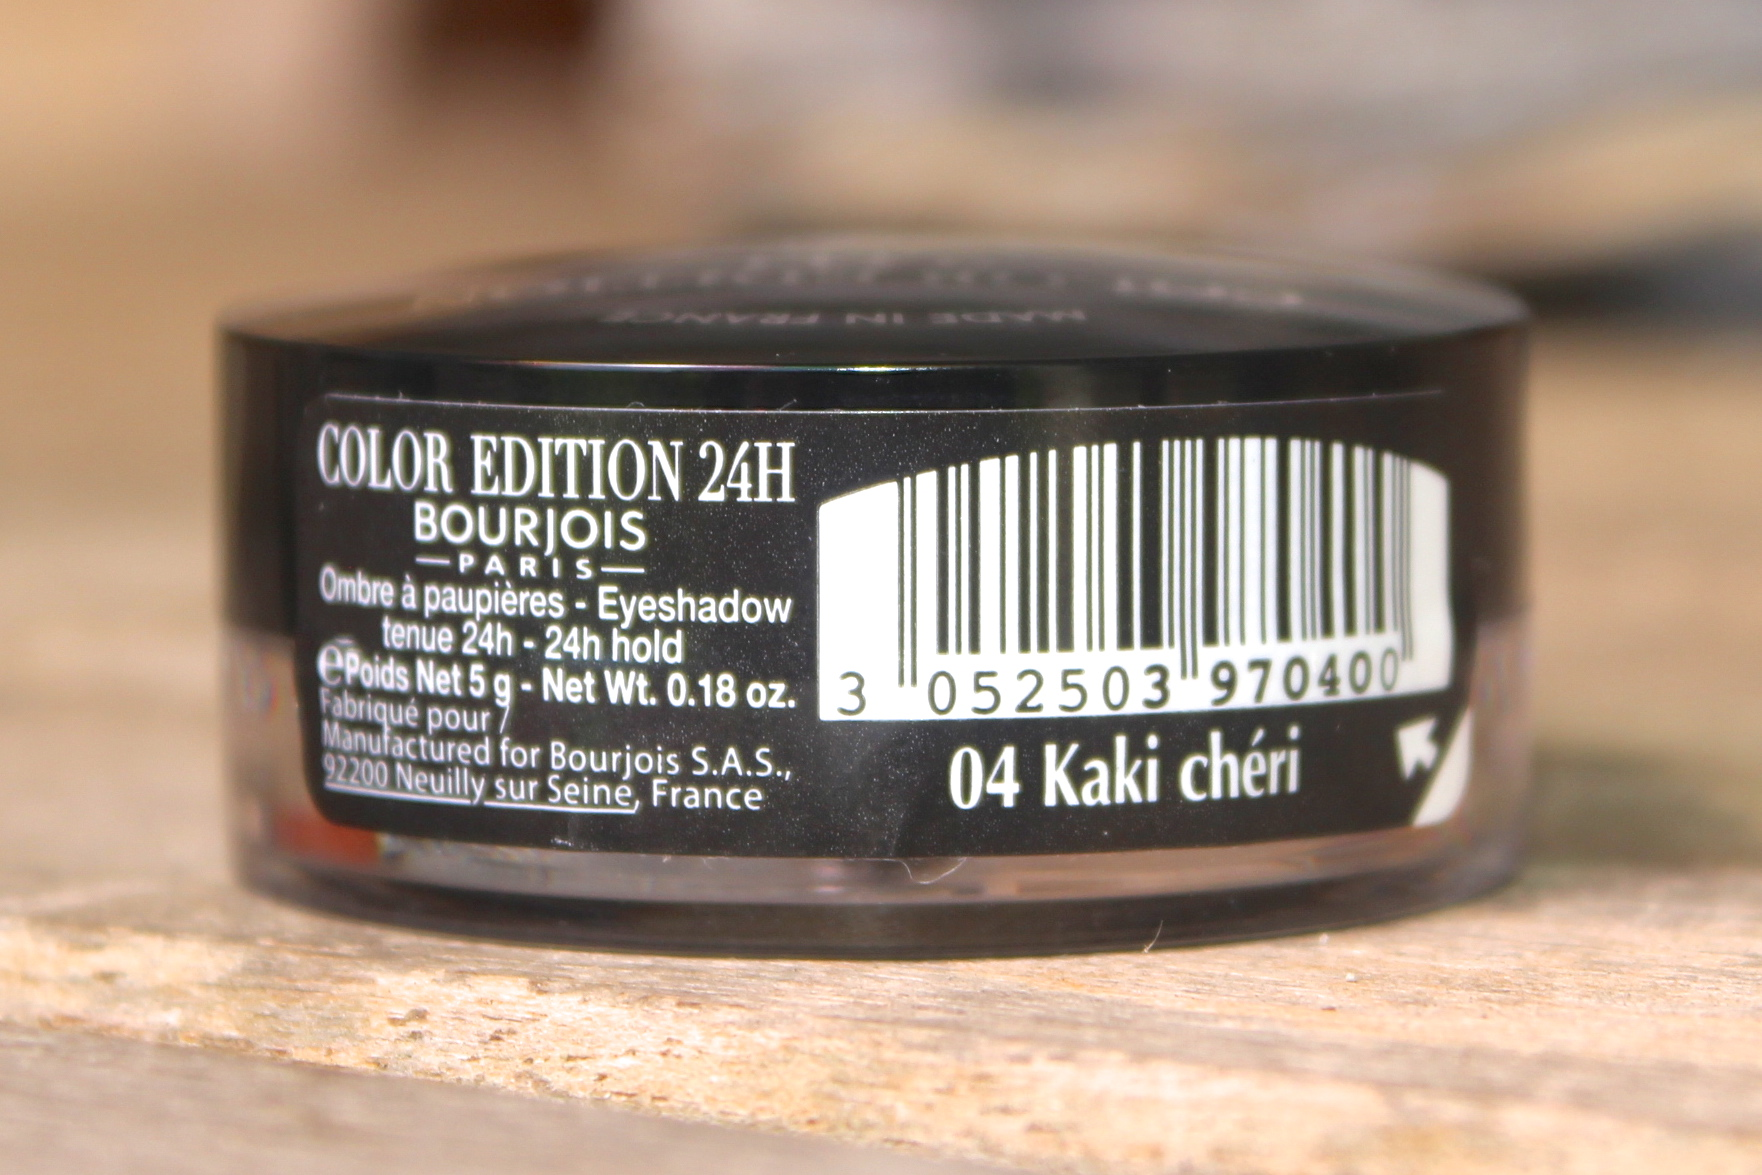 Bourjois Color edition 24h kaki cheri 3